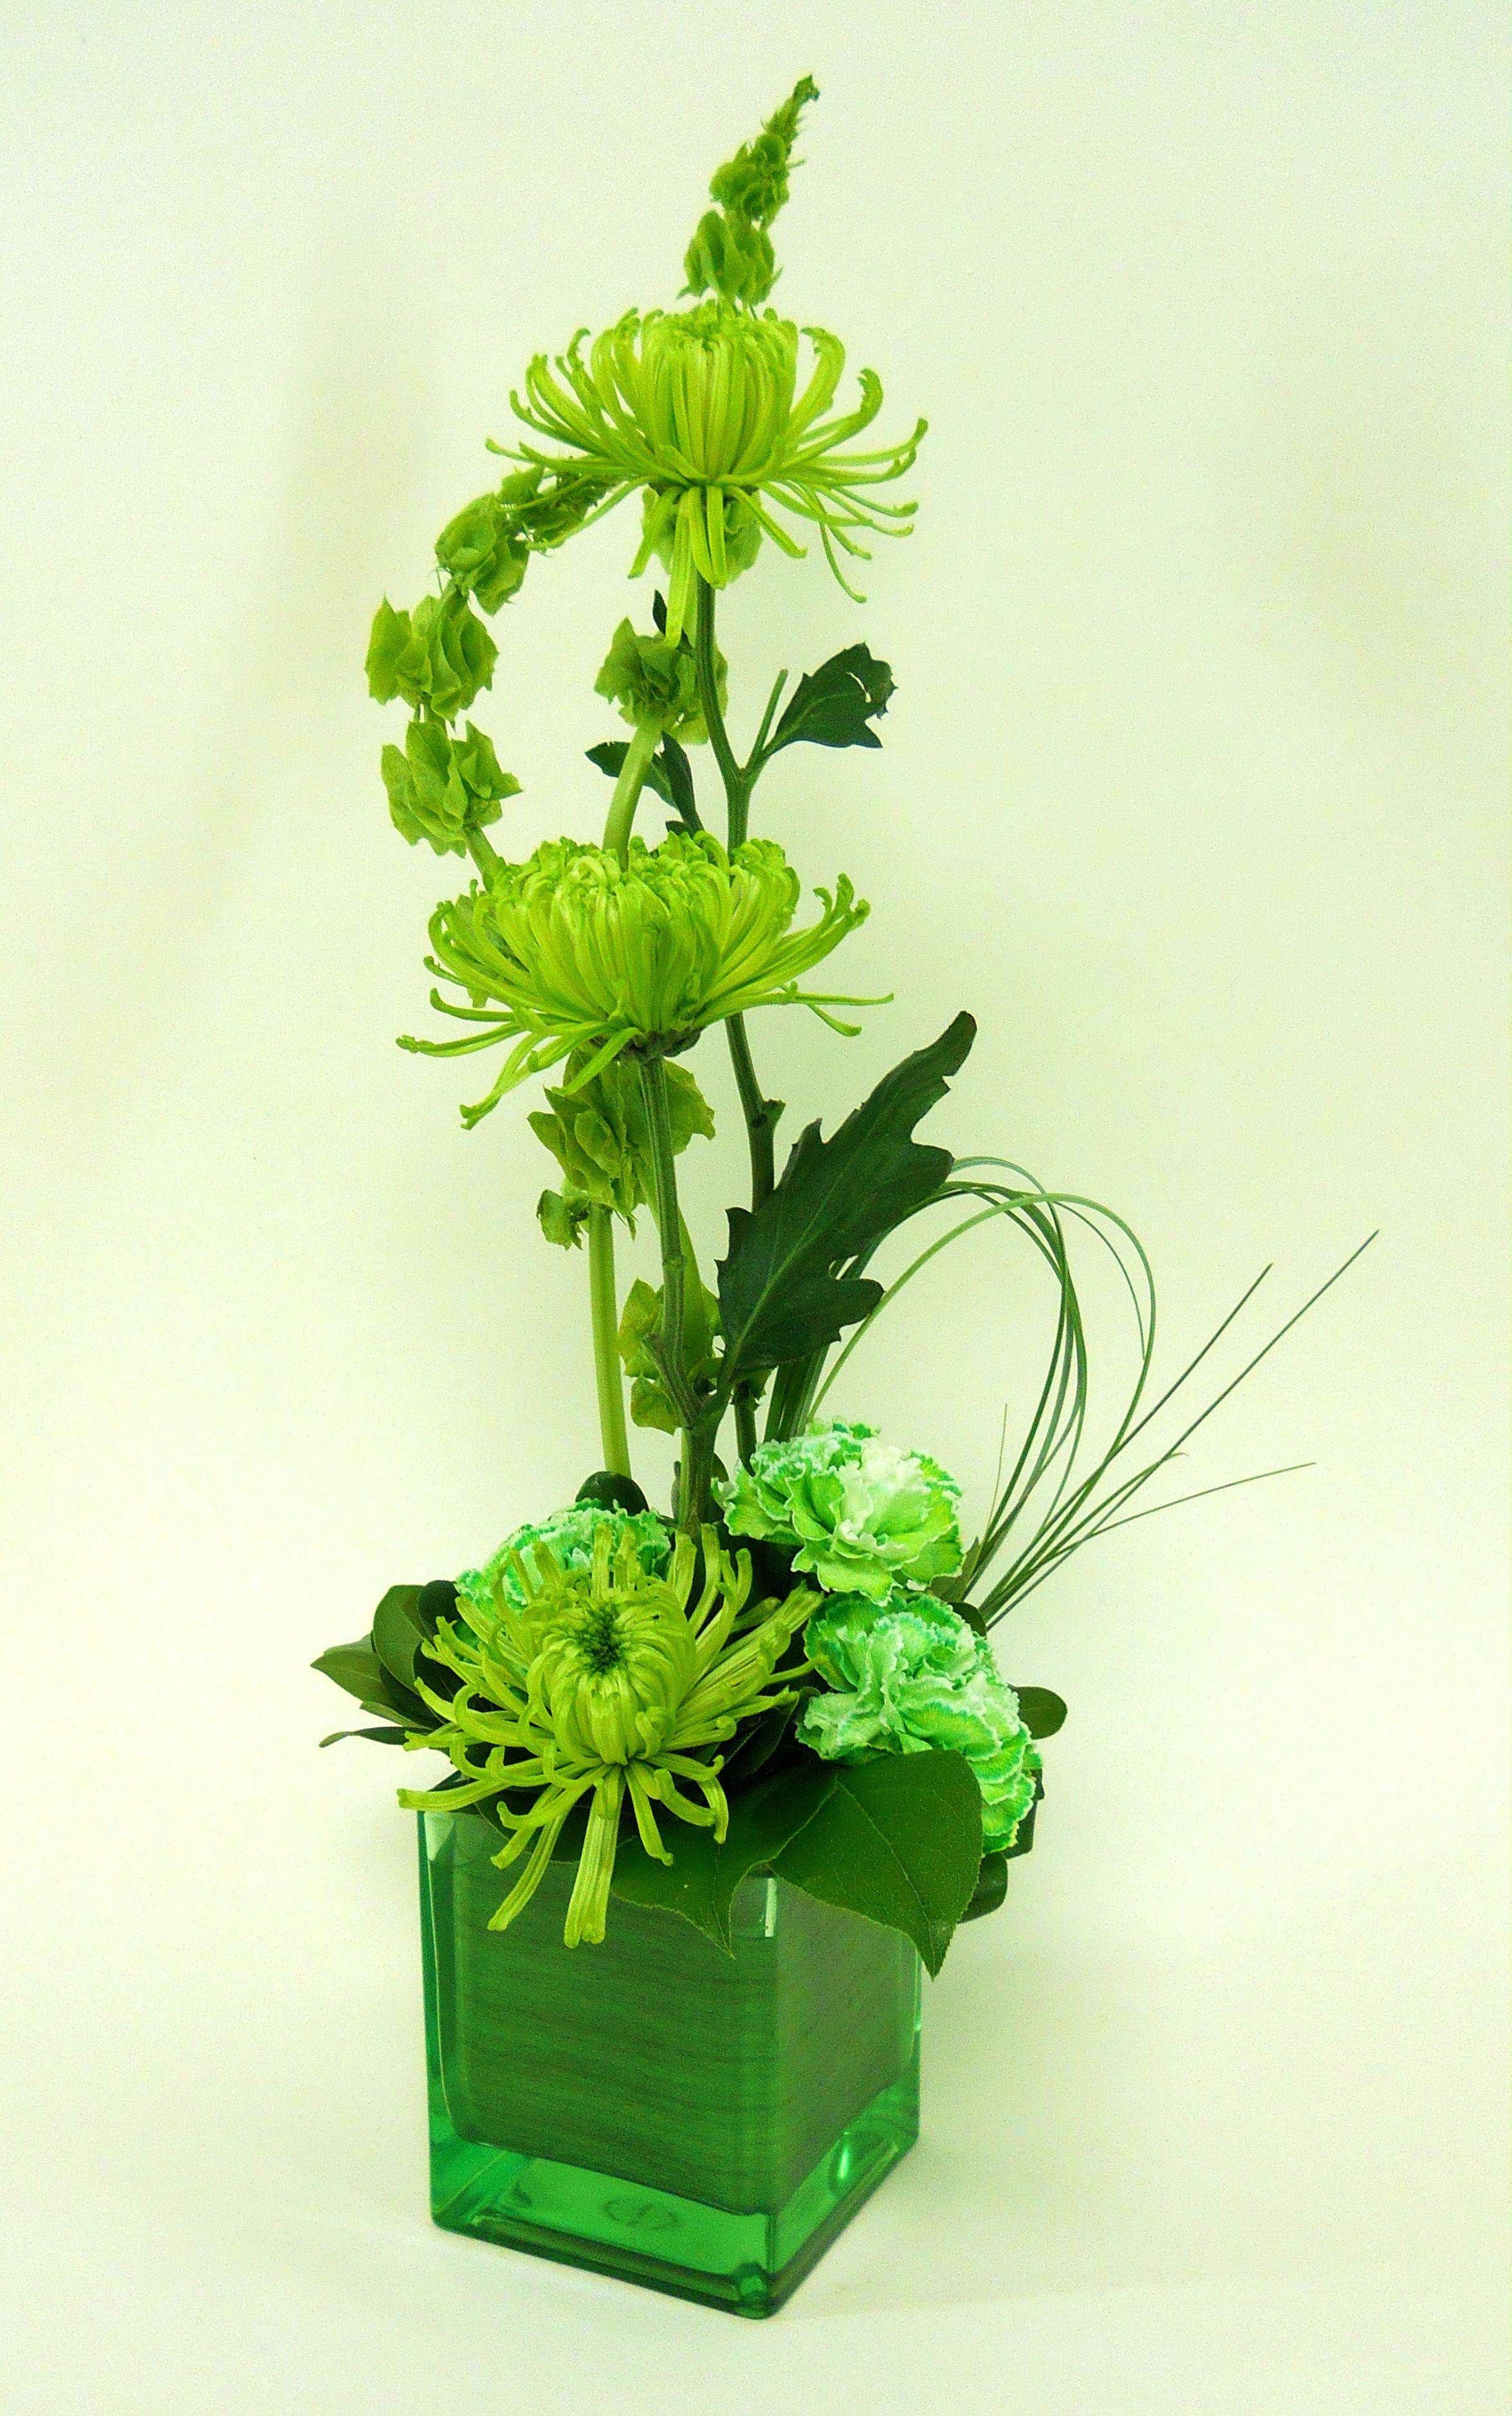 Florist And Flower Shop In Grand Rapids Holland Mi Fresh Flowers Arrangements Flower Arrangements Simple Flower Arrangements